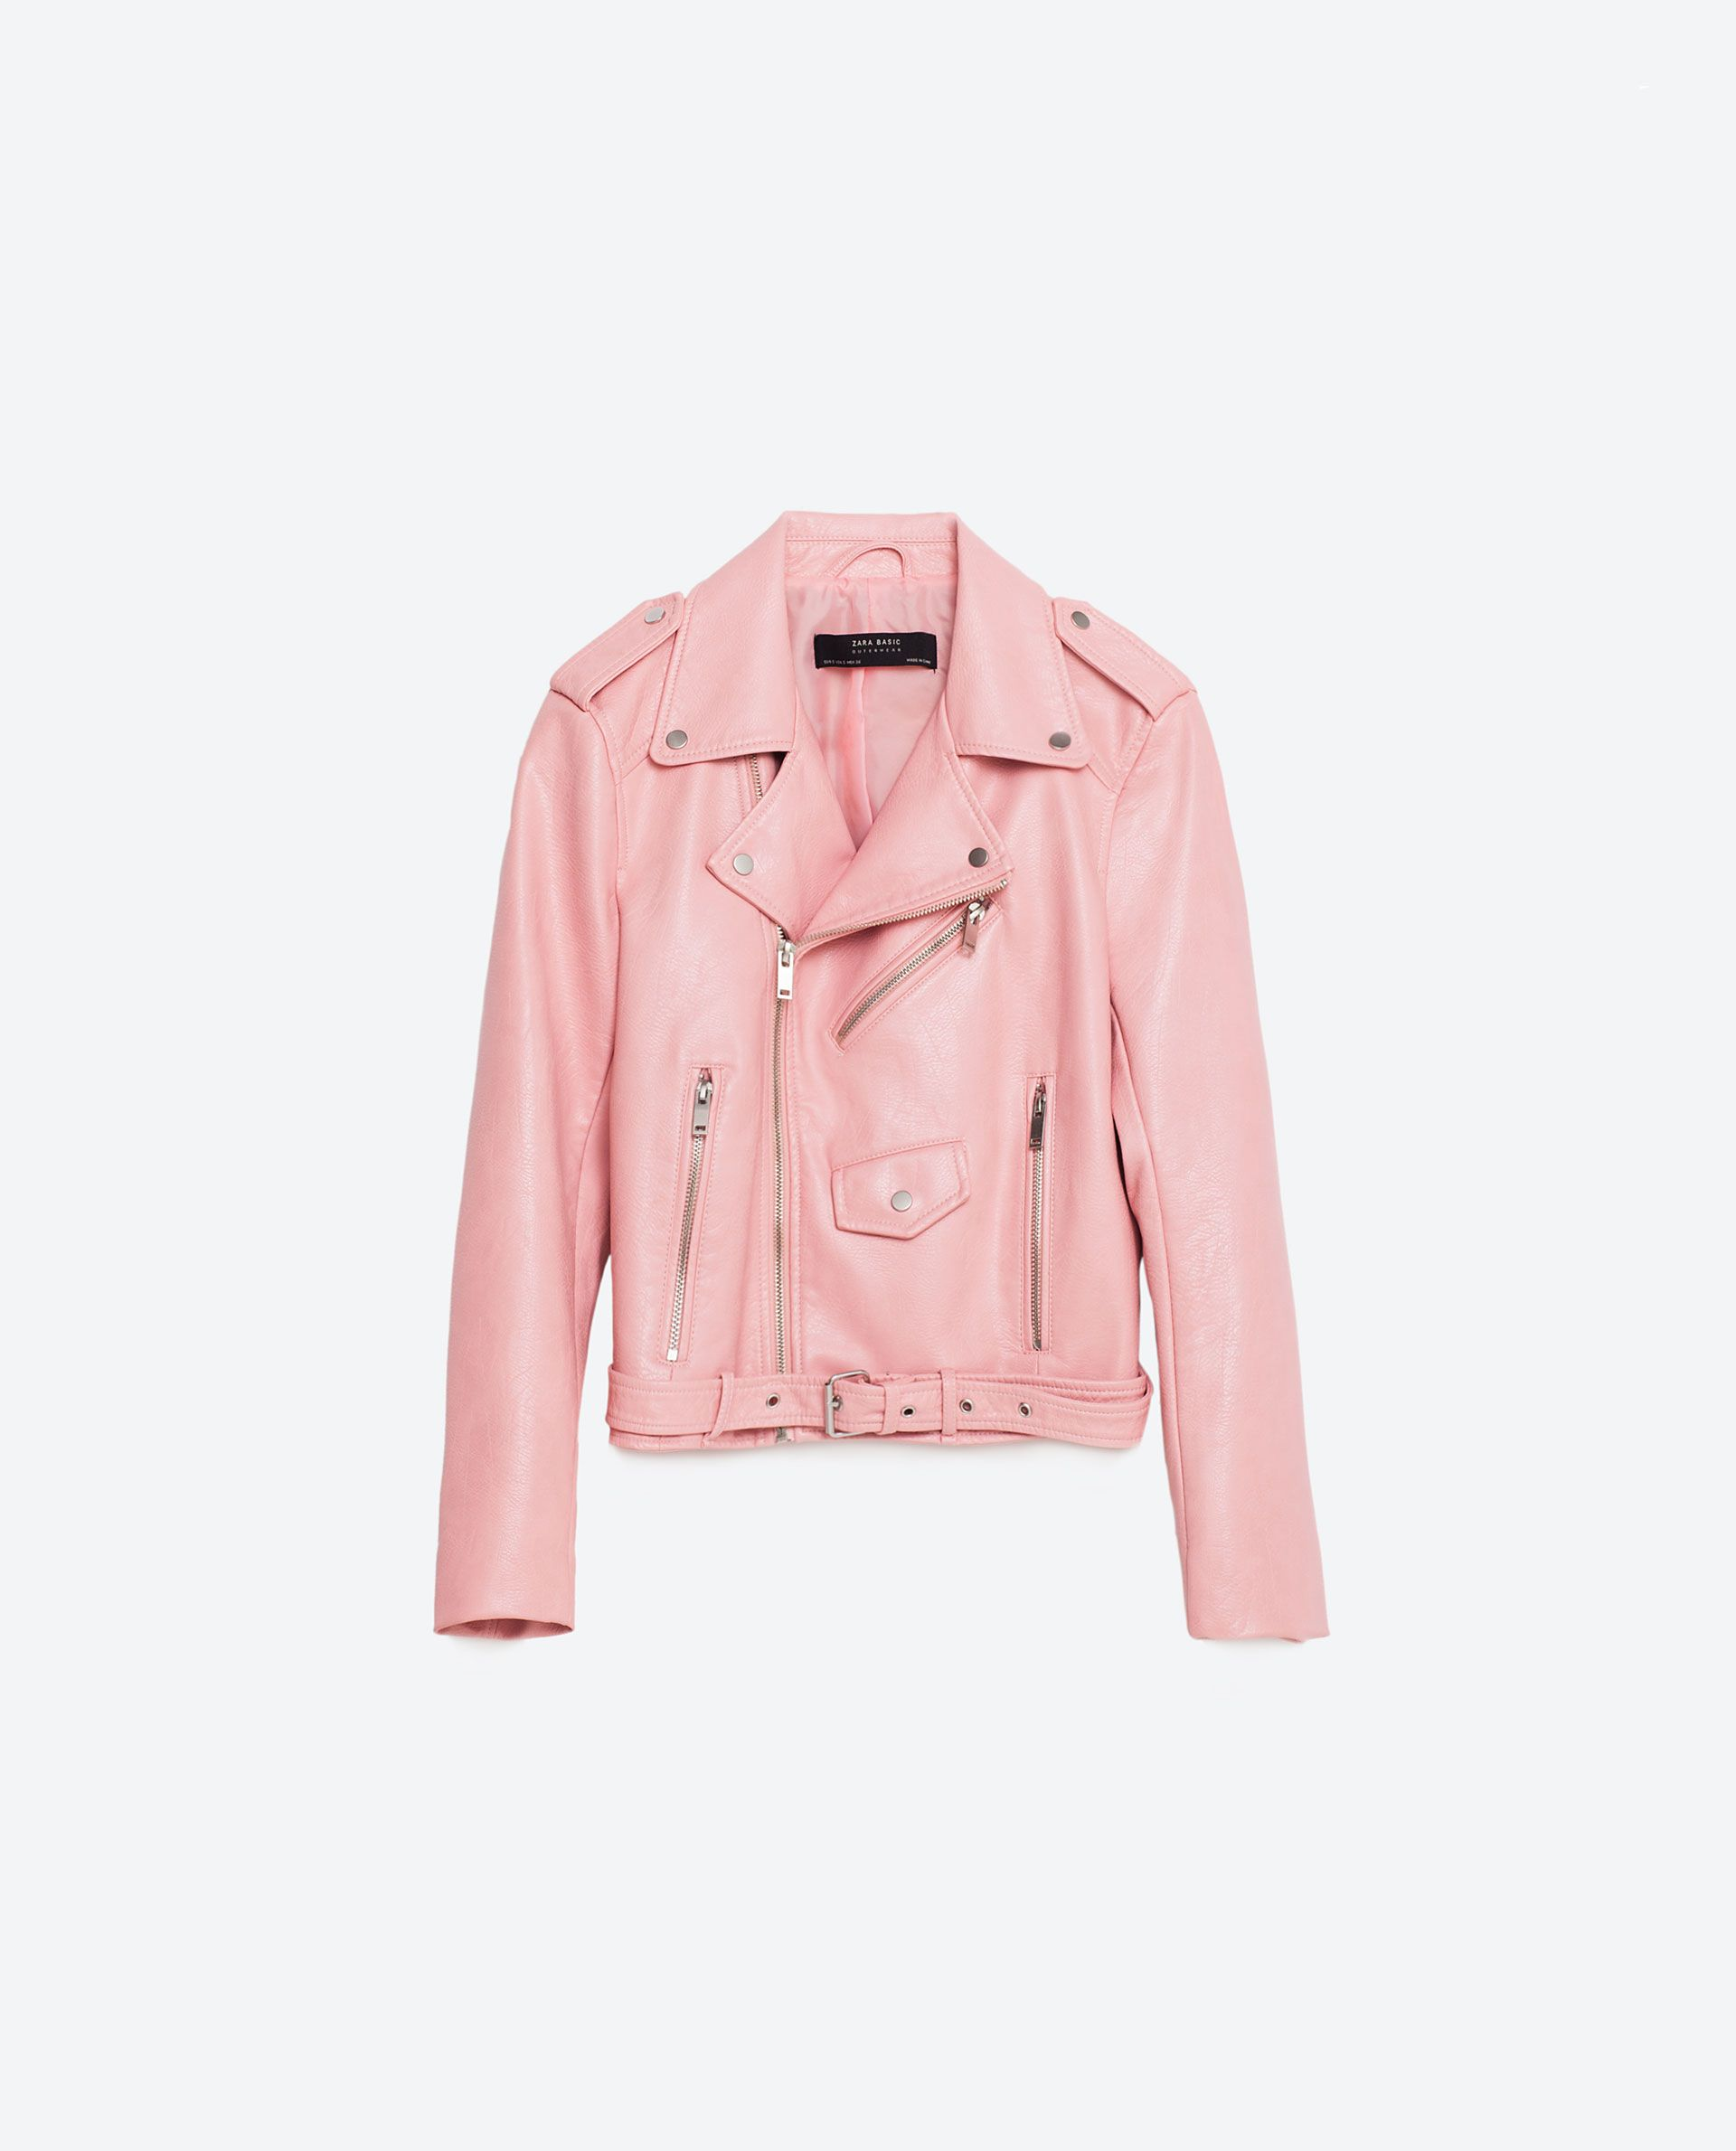 Cazadora Efecto Piel Ver Todo Mujer Ultima Semana Leather Jackets Women Womens Fashion Jackets Leather Jacket Style [ 2379 x 1920 Pixel ]